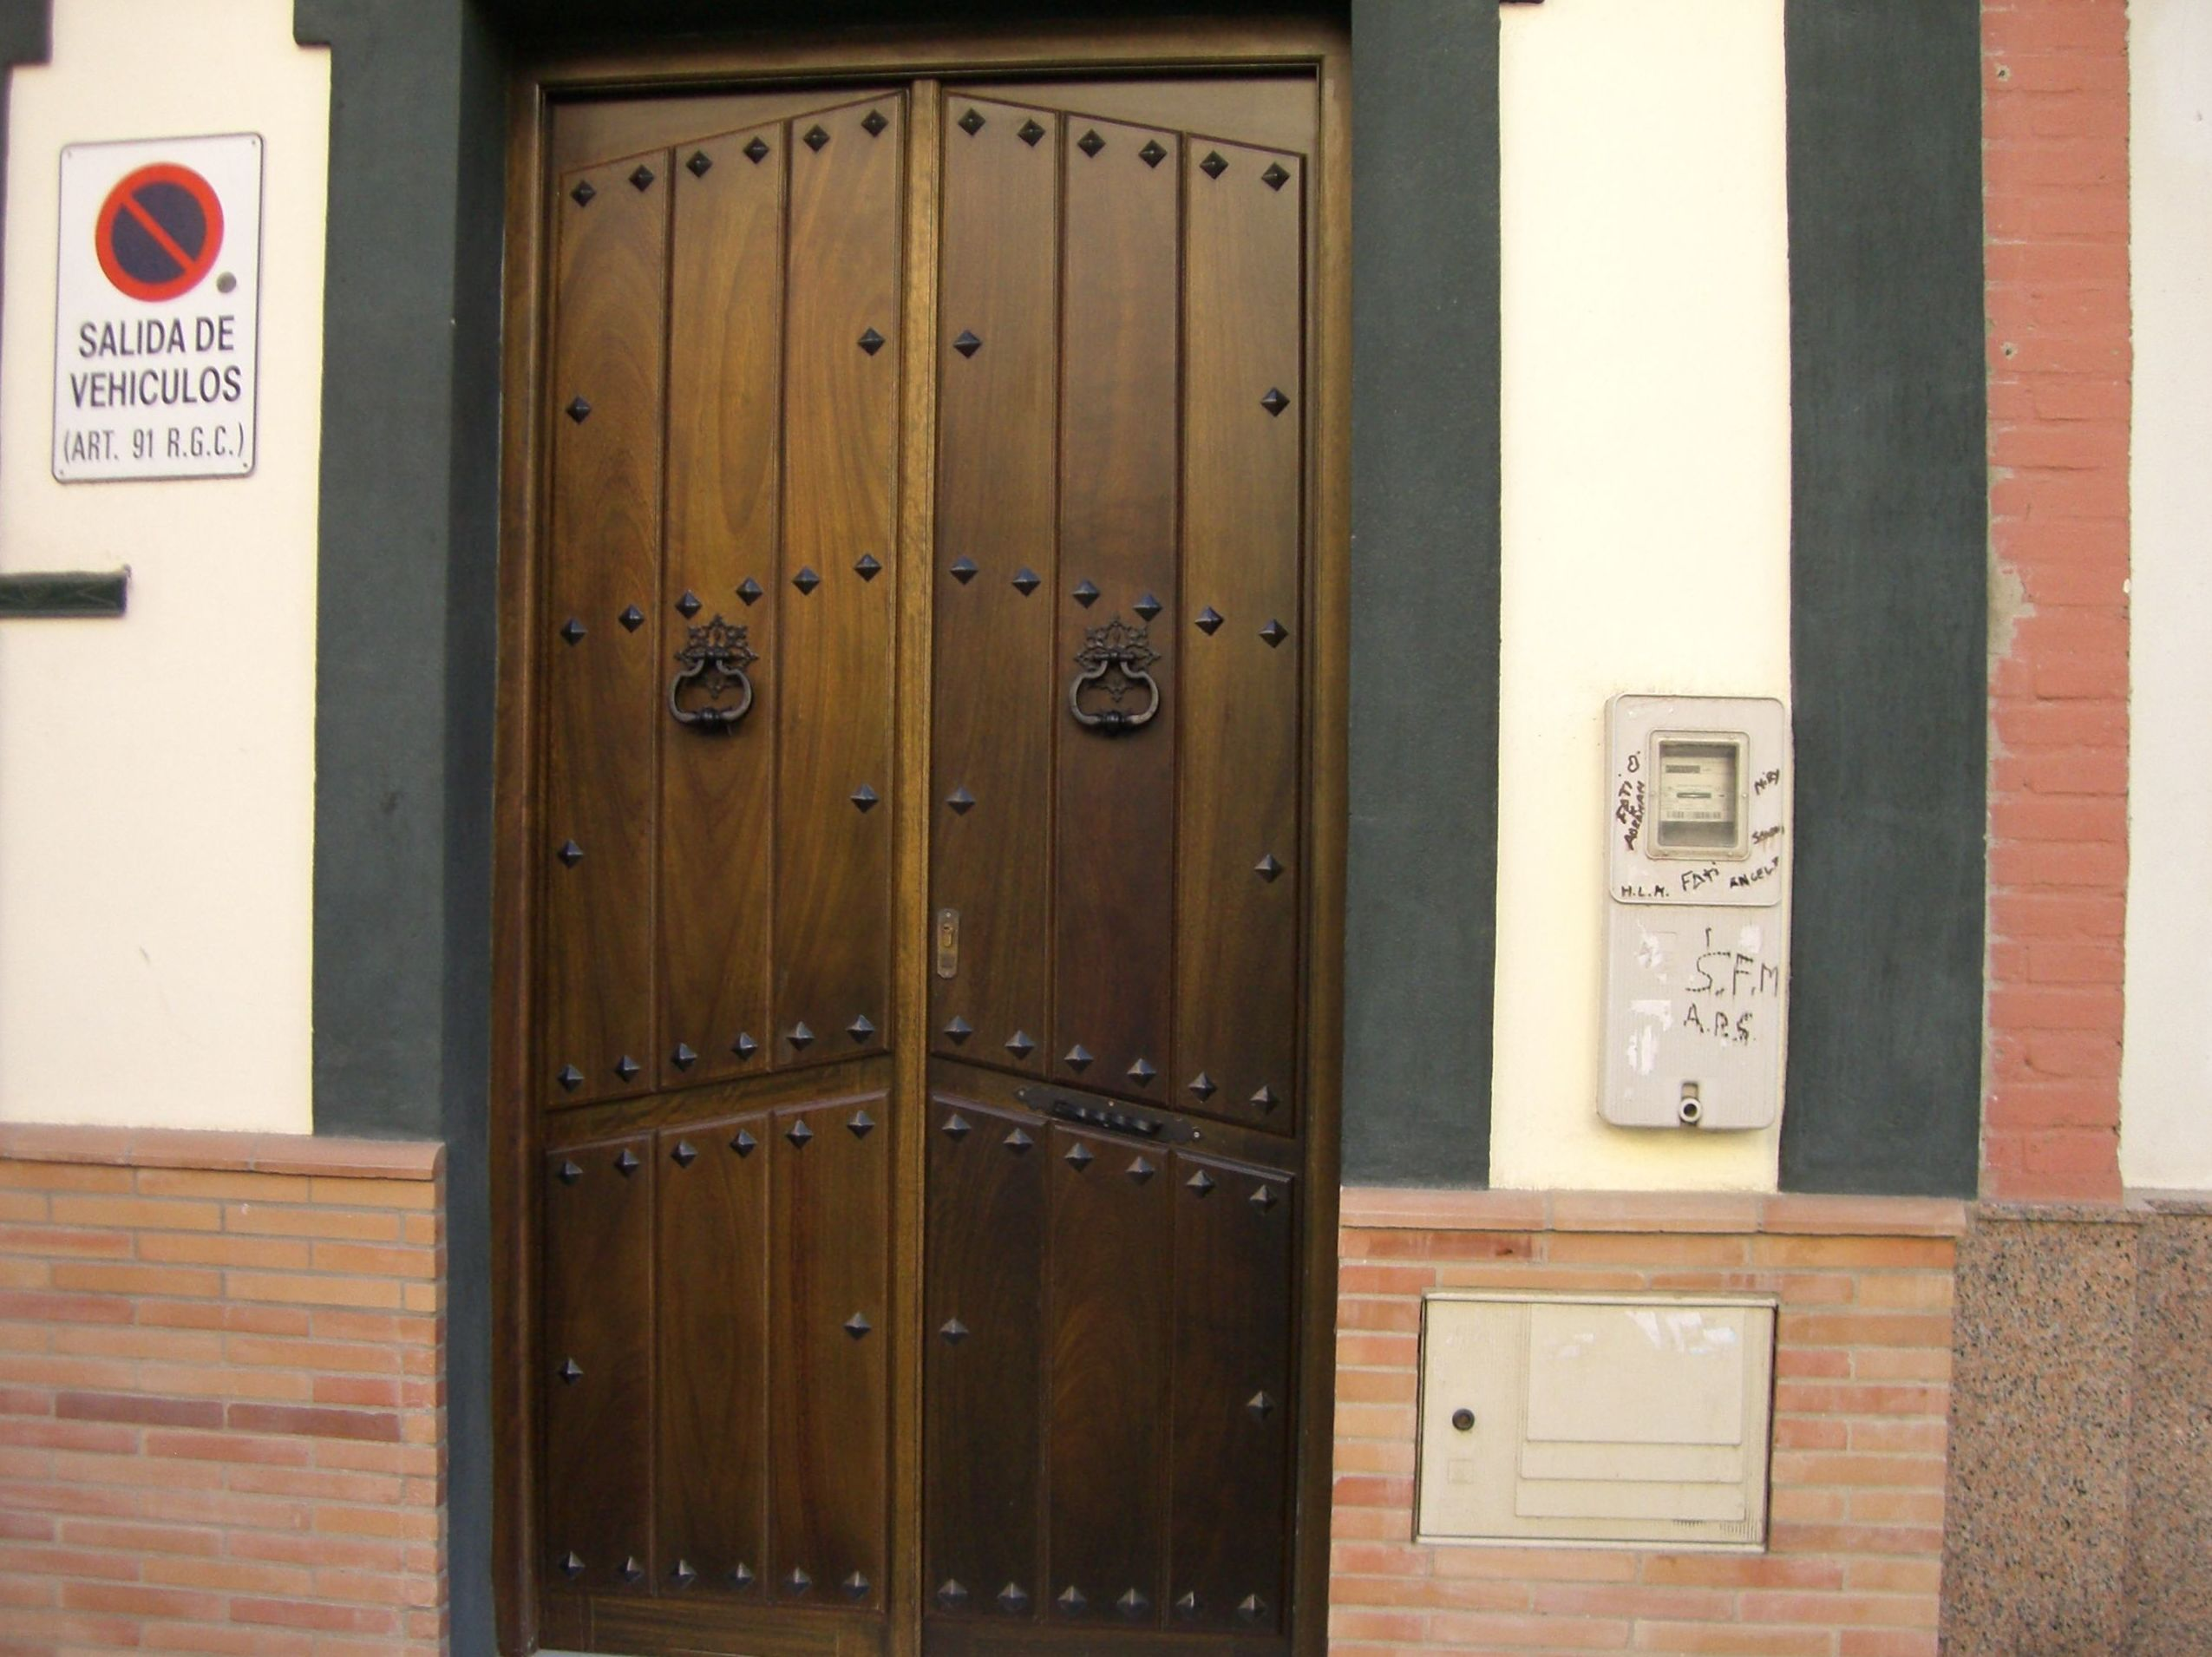 Foto 31 de Carpintería en Alcalá de Guadaíra | CARPINTERÍA Y EBANISTERÍA ARCAMADE